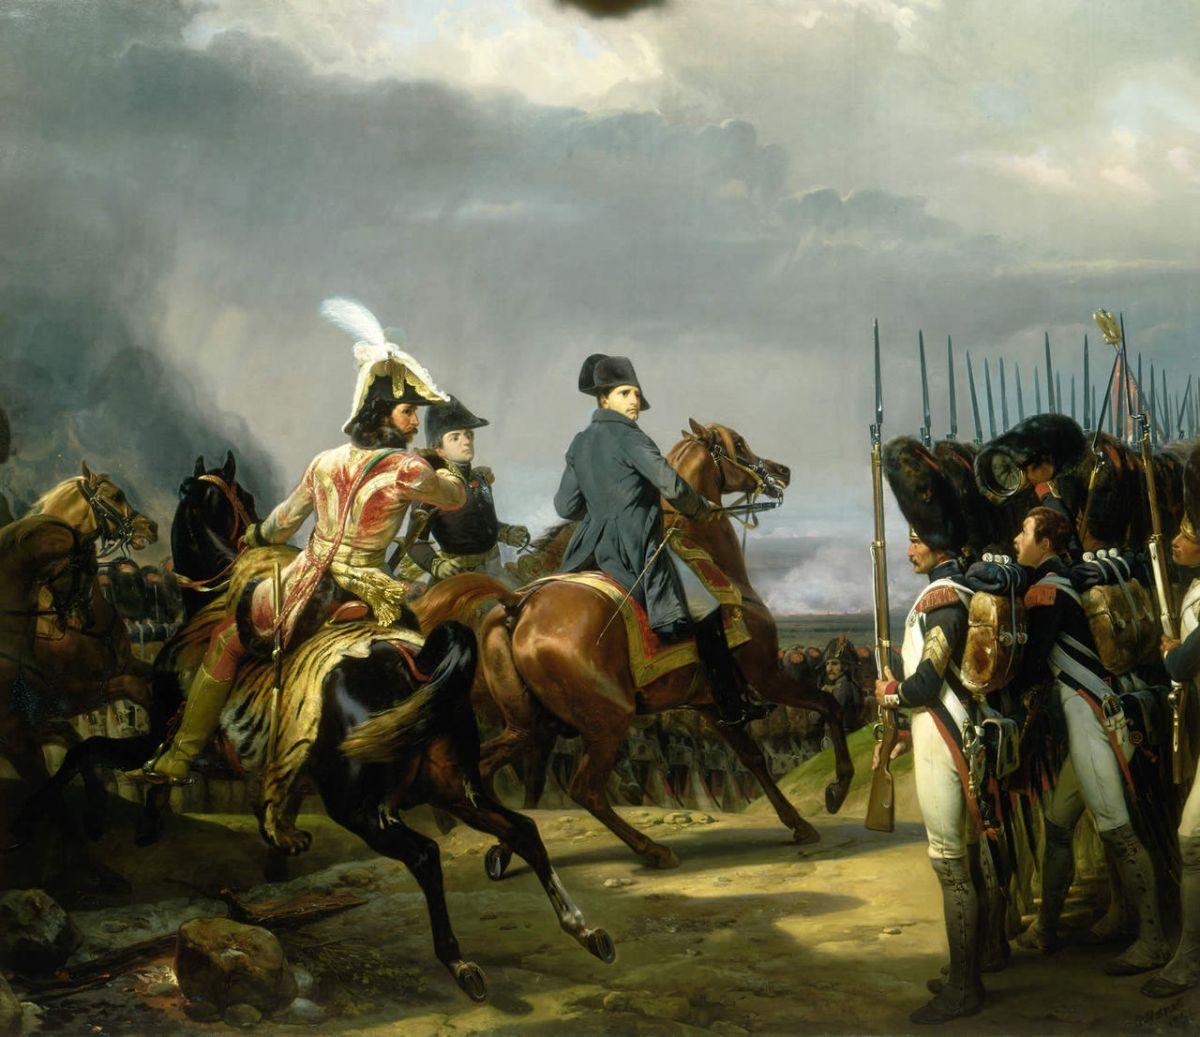 The Napoleonic Art of War.